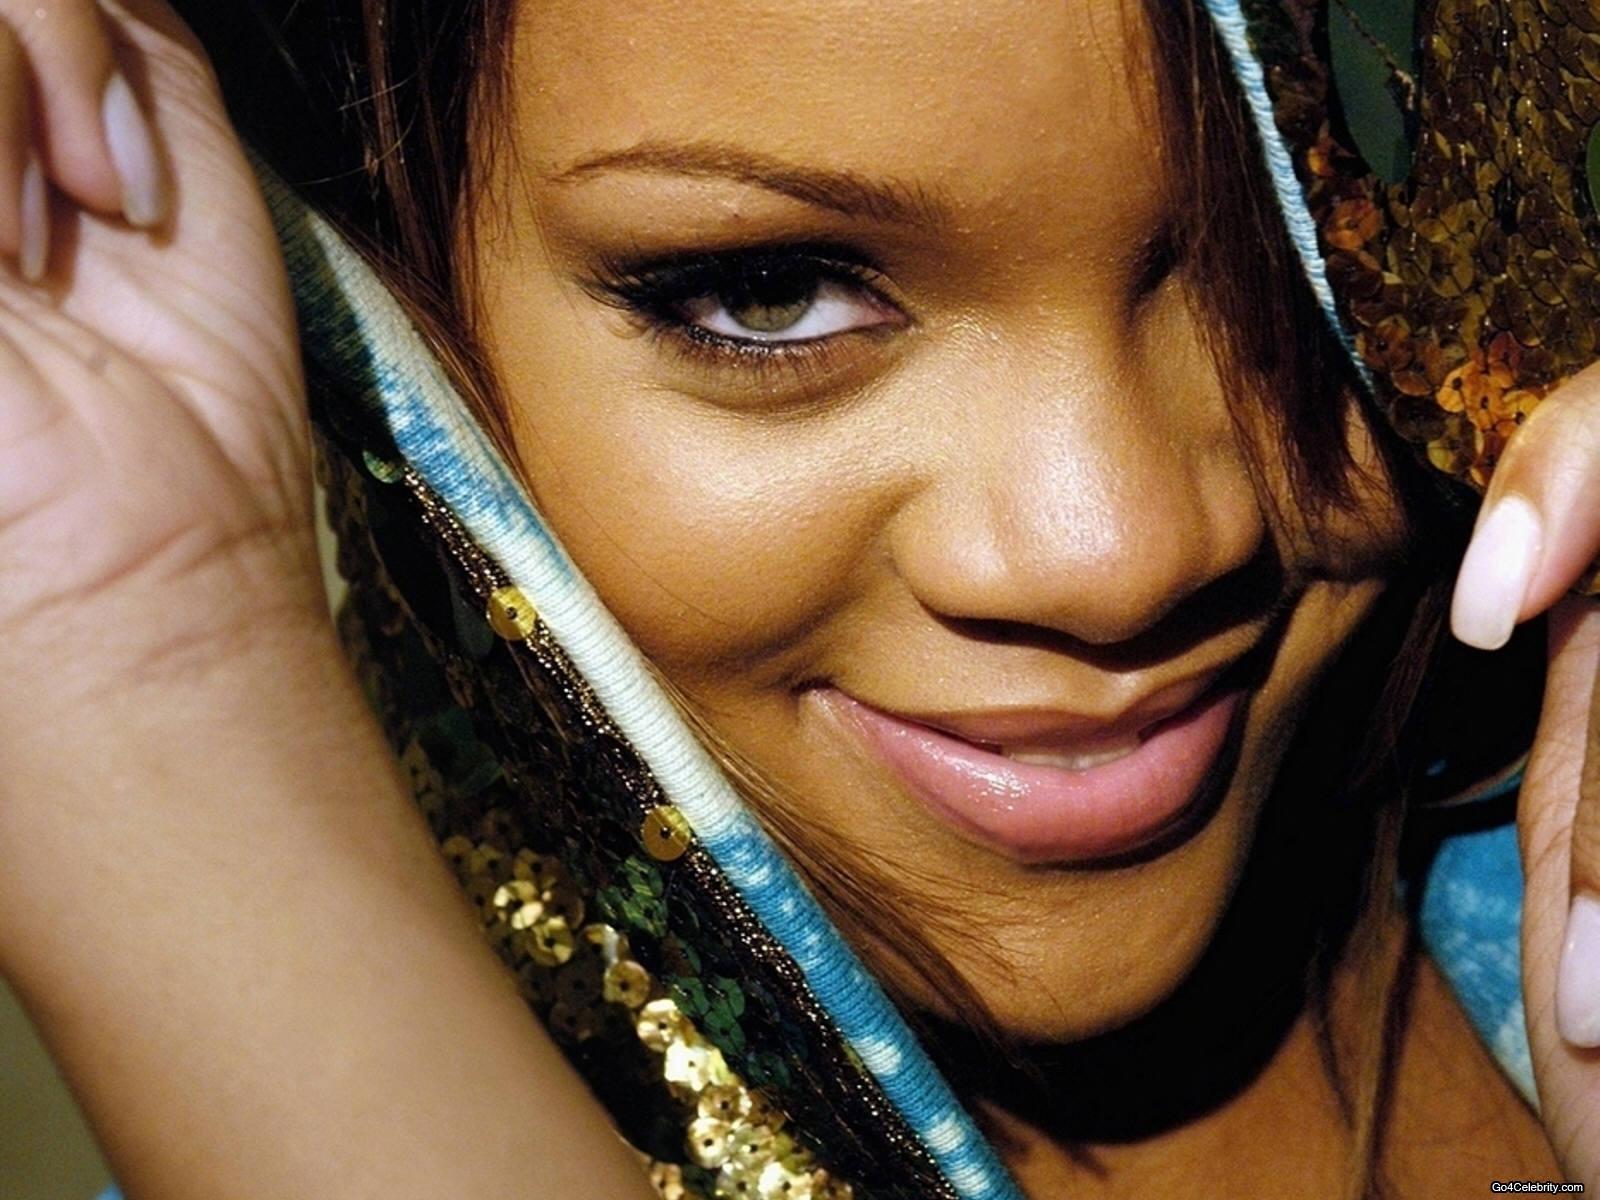 http://images2.fanpop.com/images/photos/6800000/Rihanna-rihanna-6848182-1600-1200.jpg